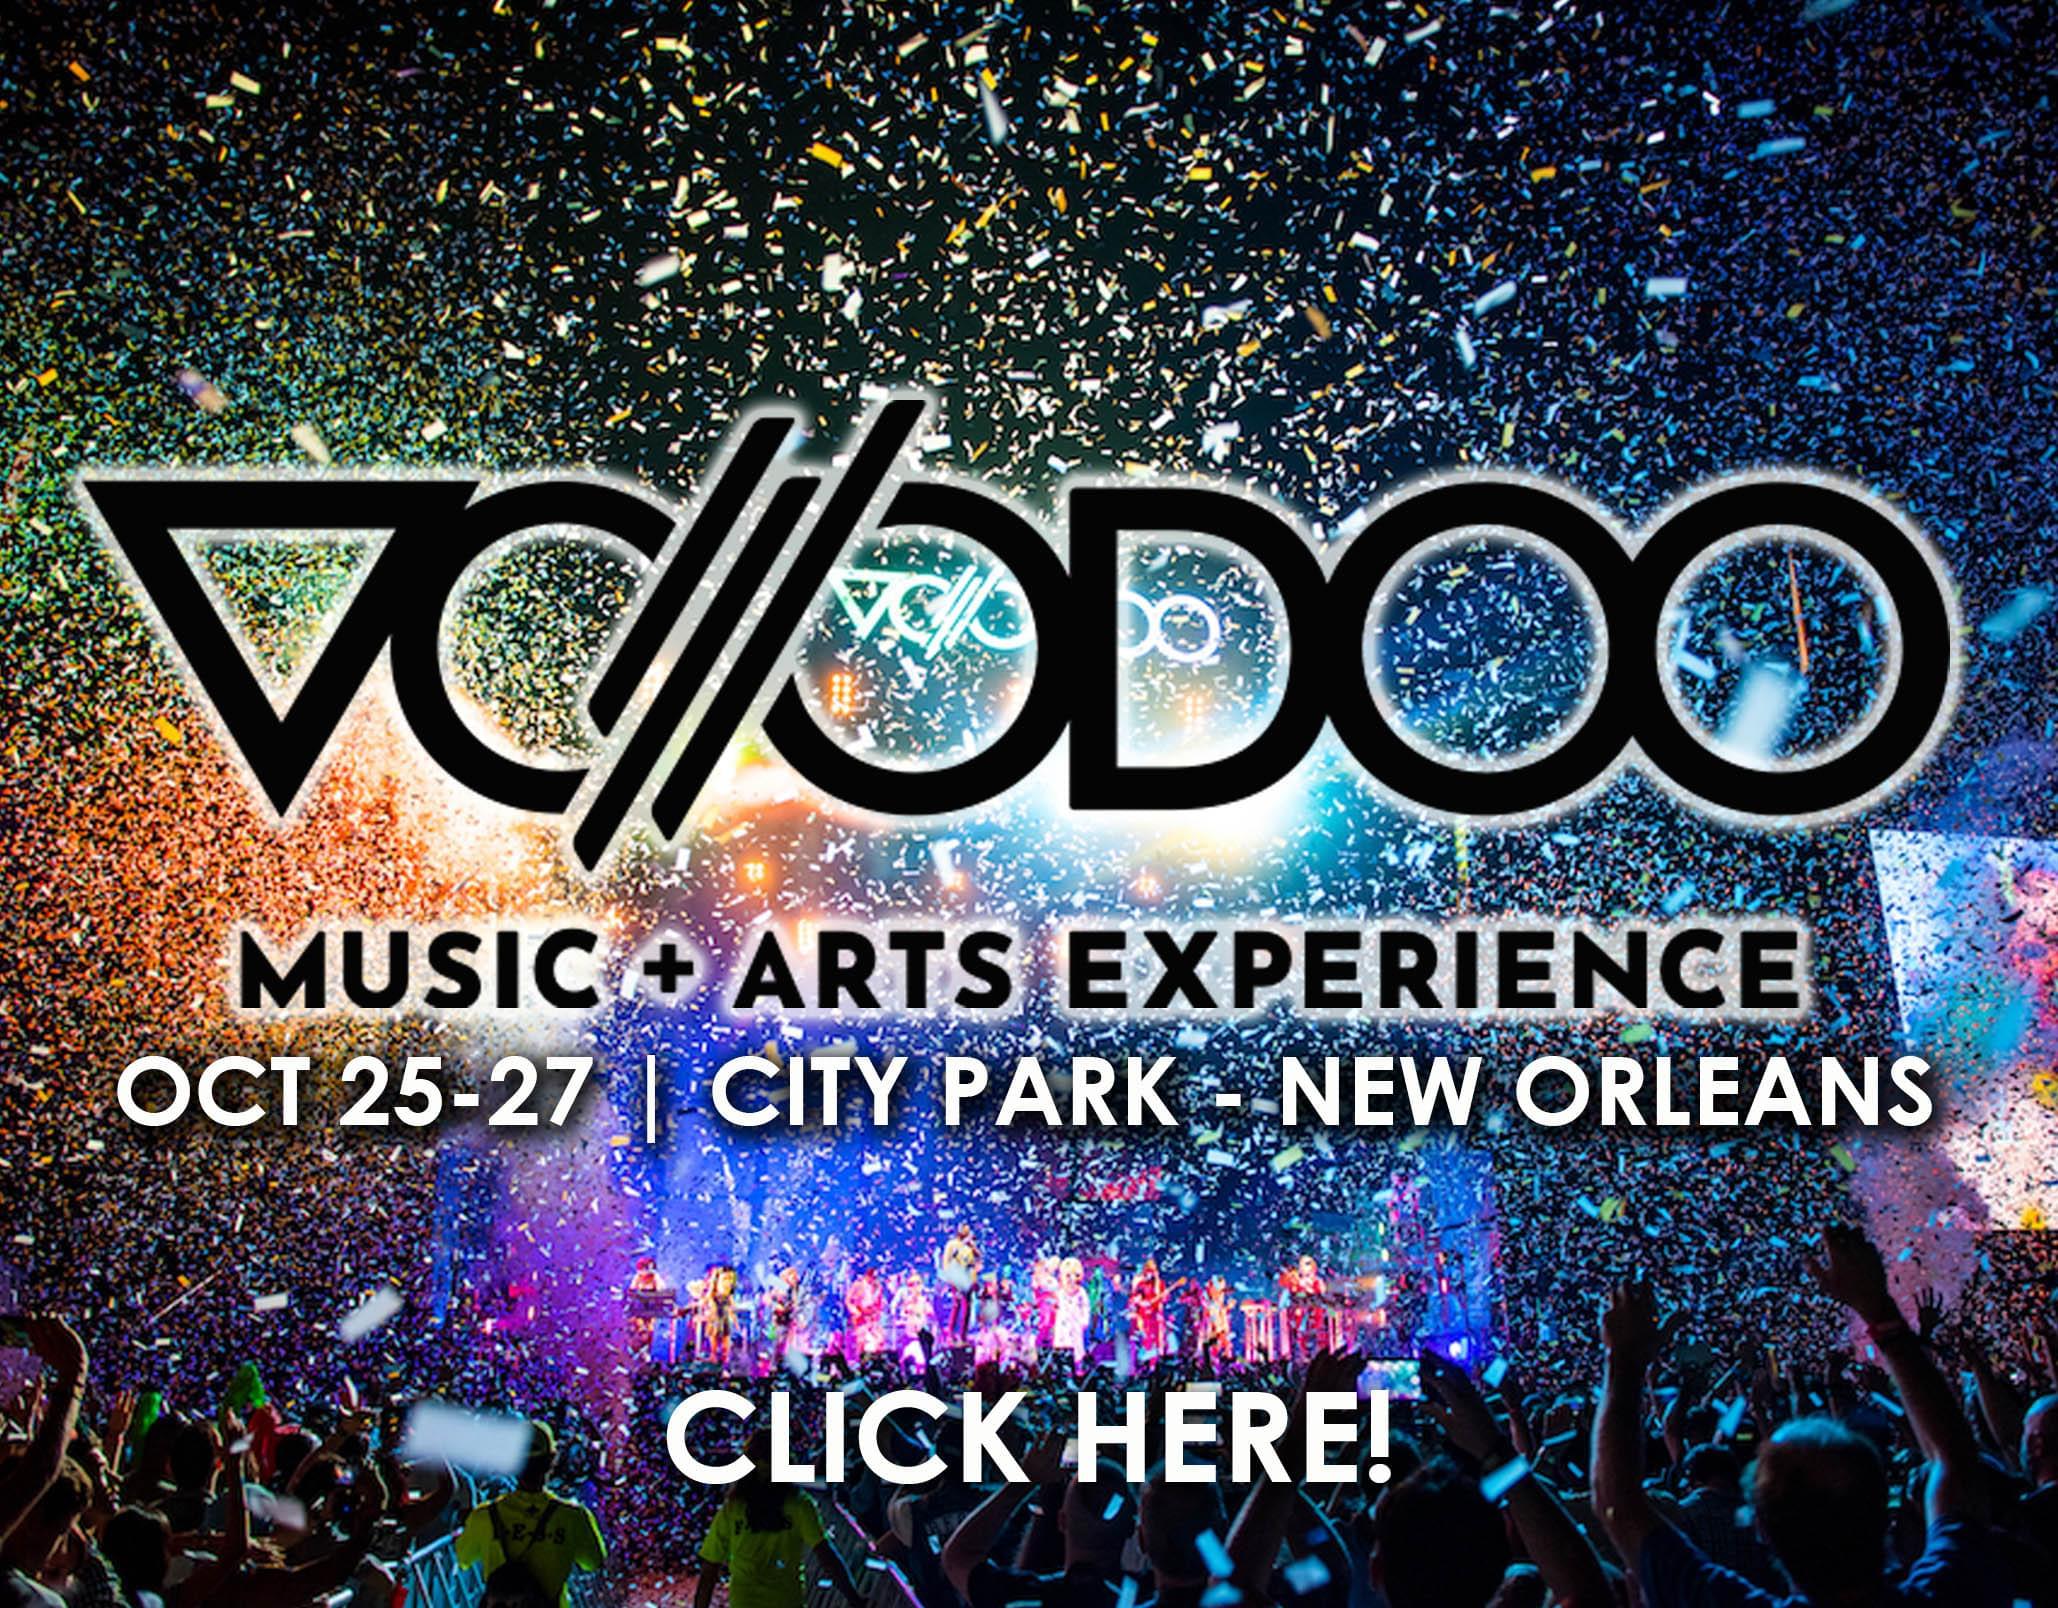 Win Voodoo Music + Arts Experience Passes